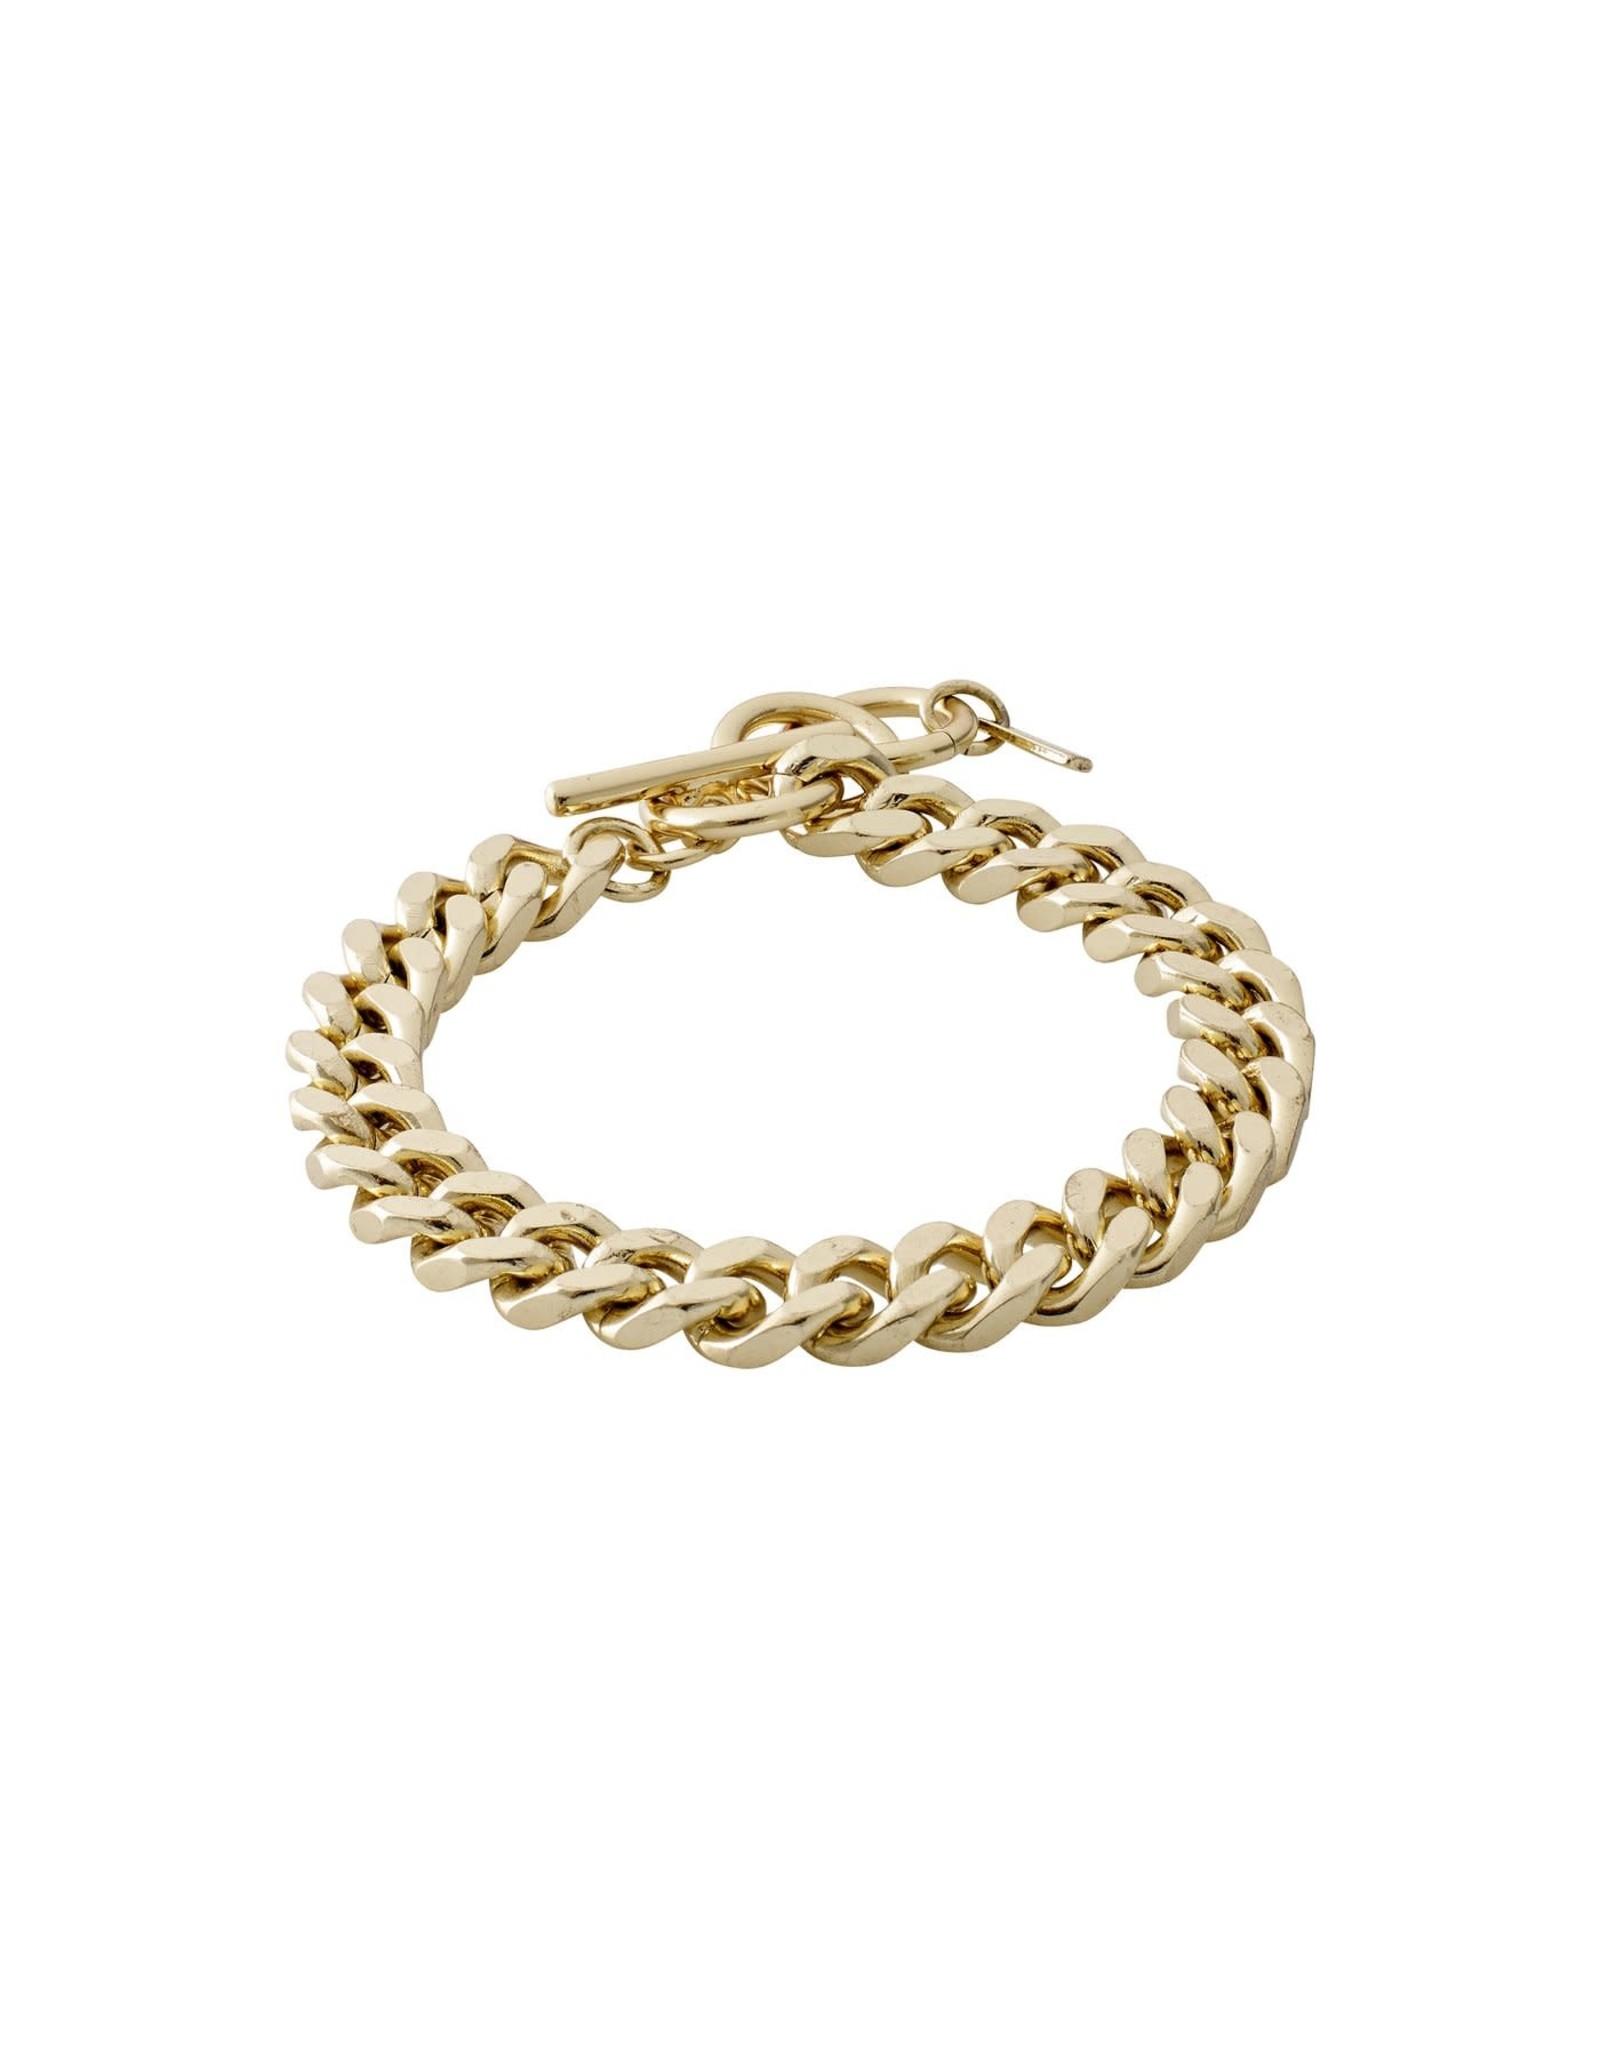 Pilgrim Pilgrim Water Bracelet Gold Plated